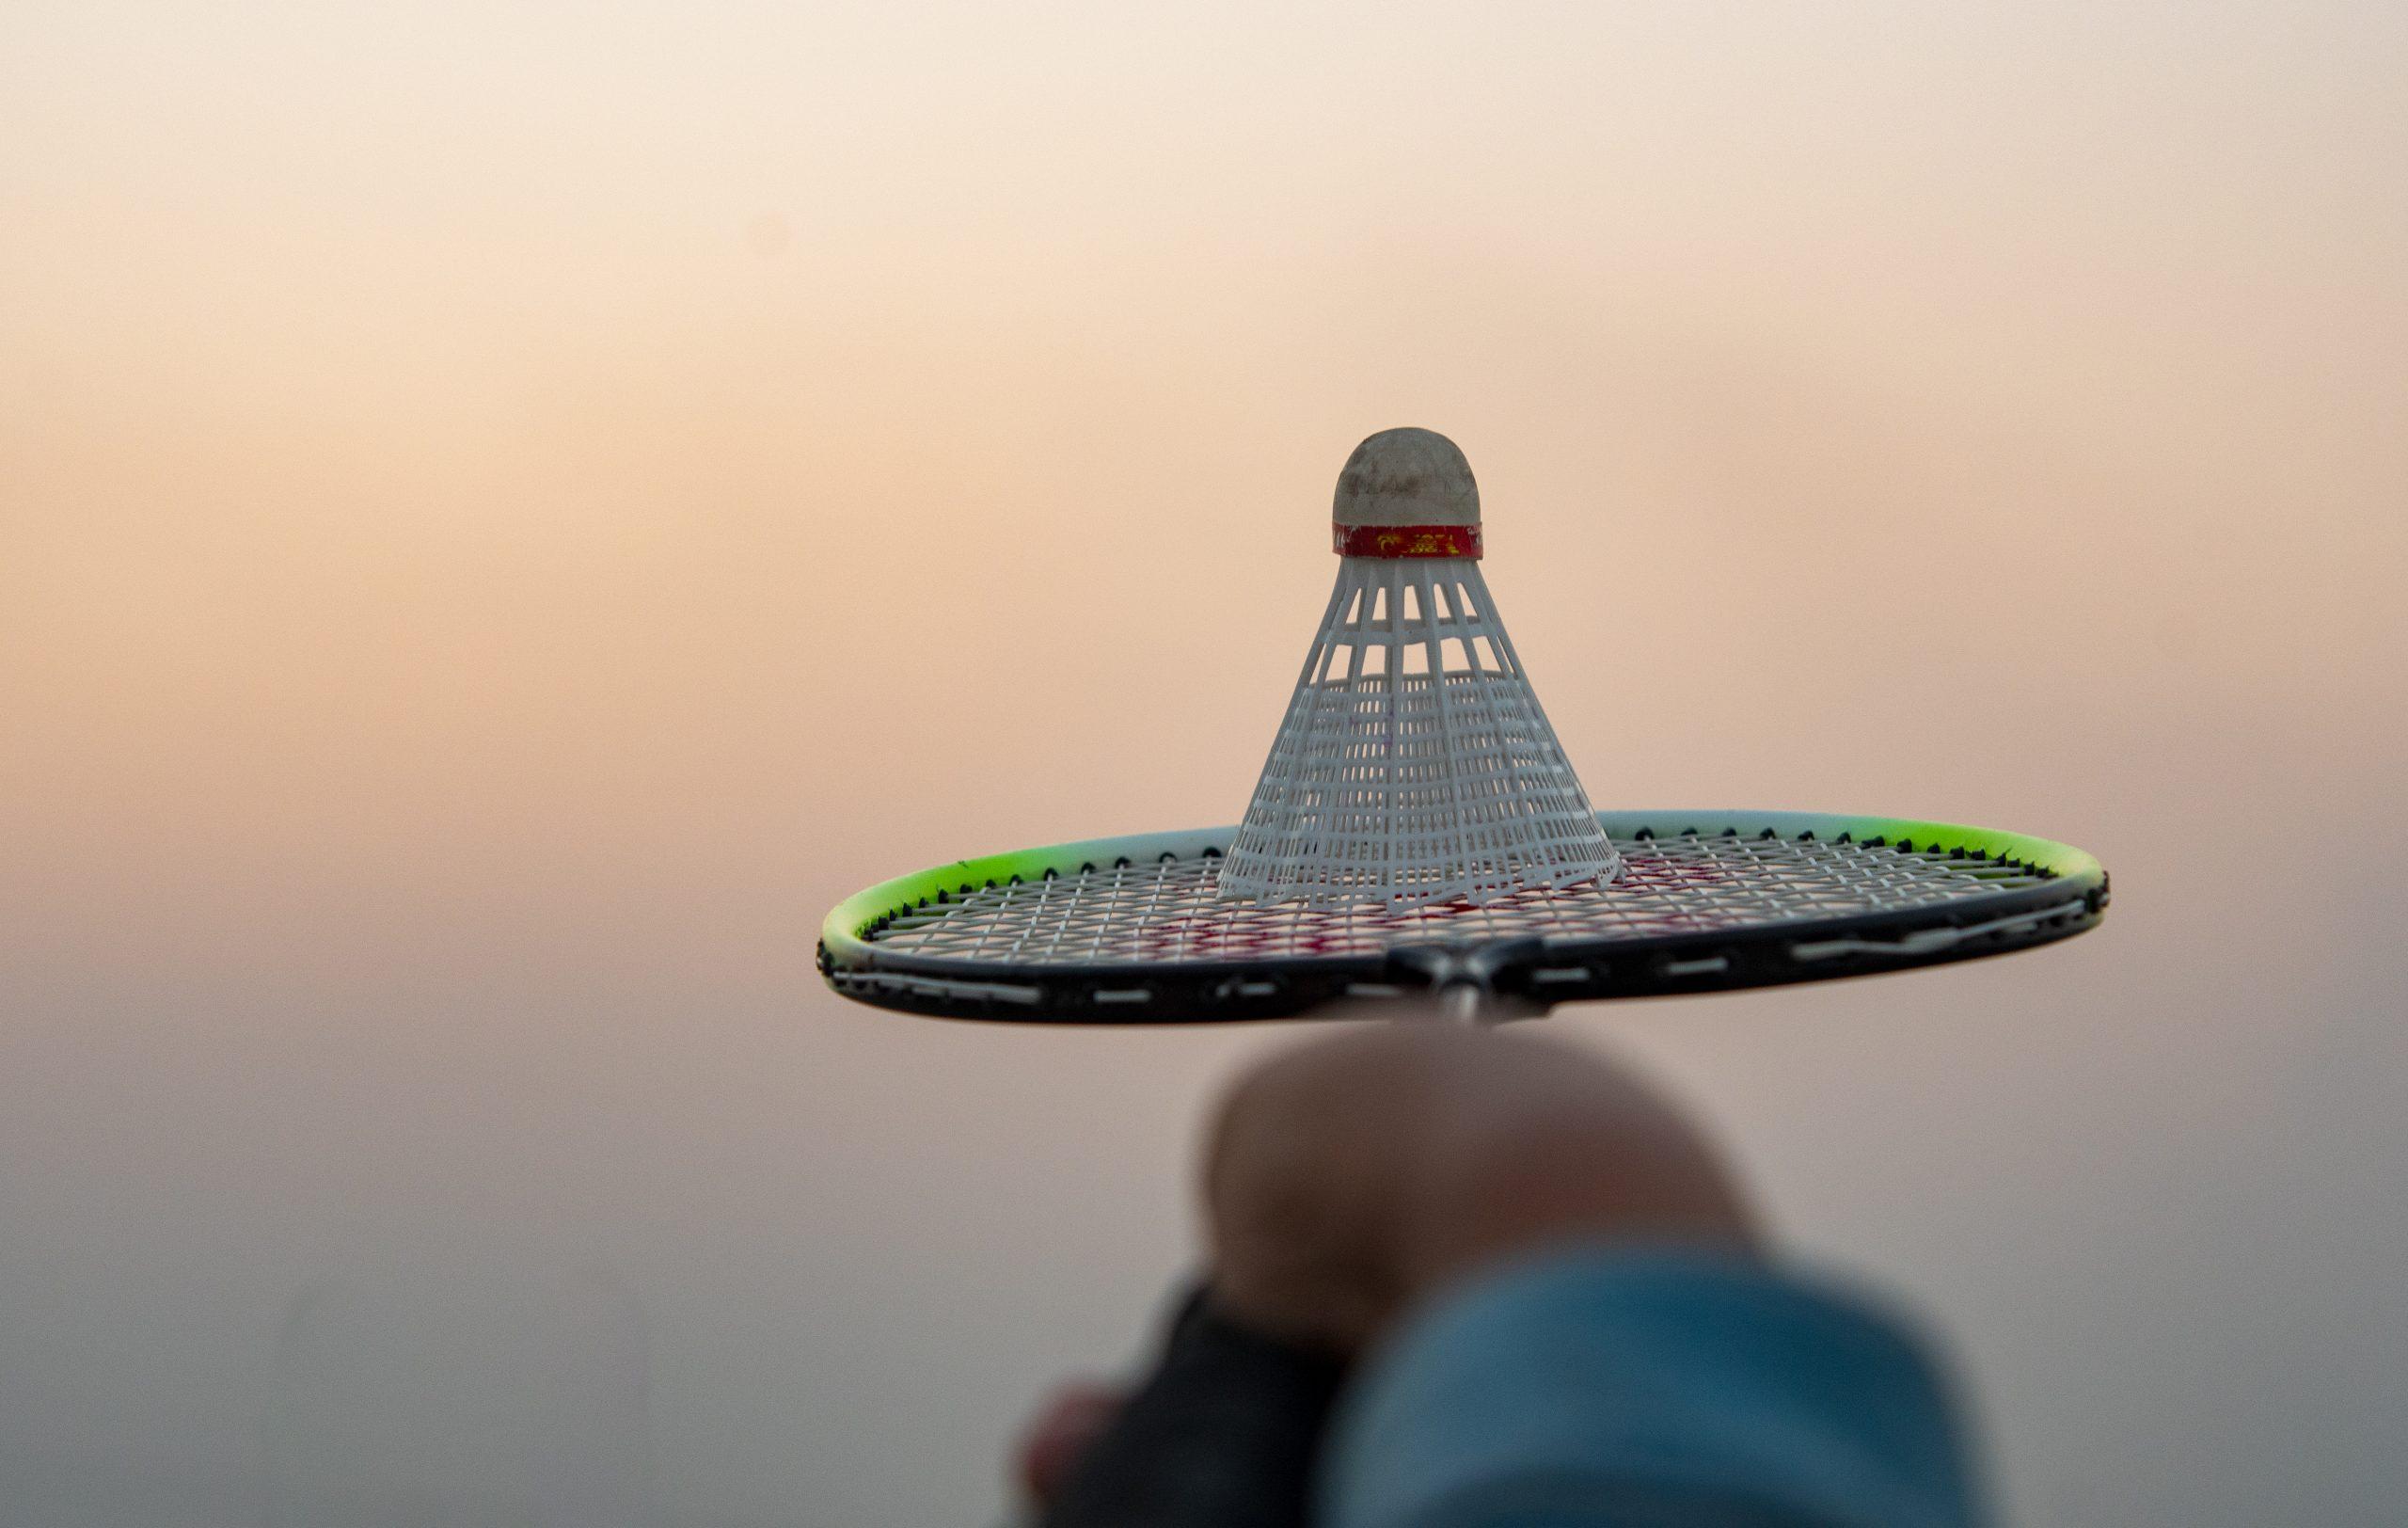 Shuttle on Badminton